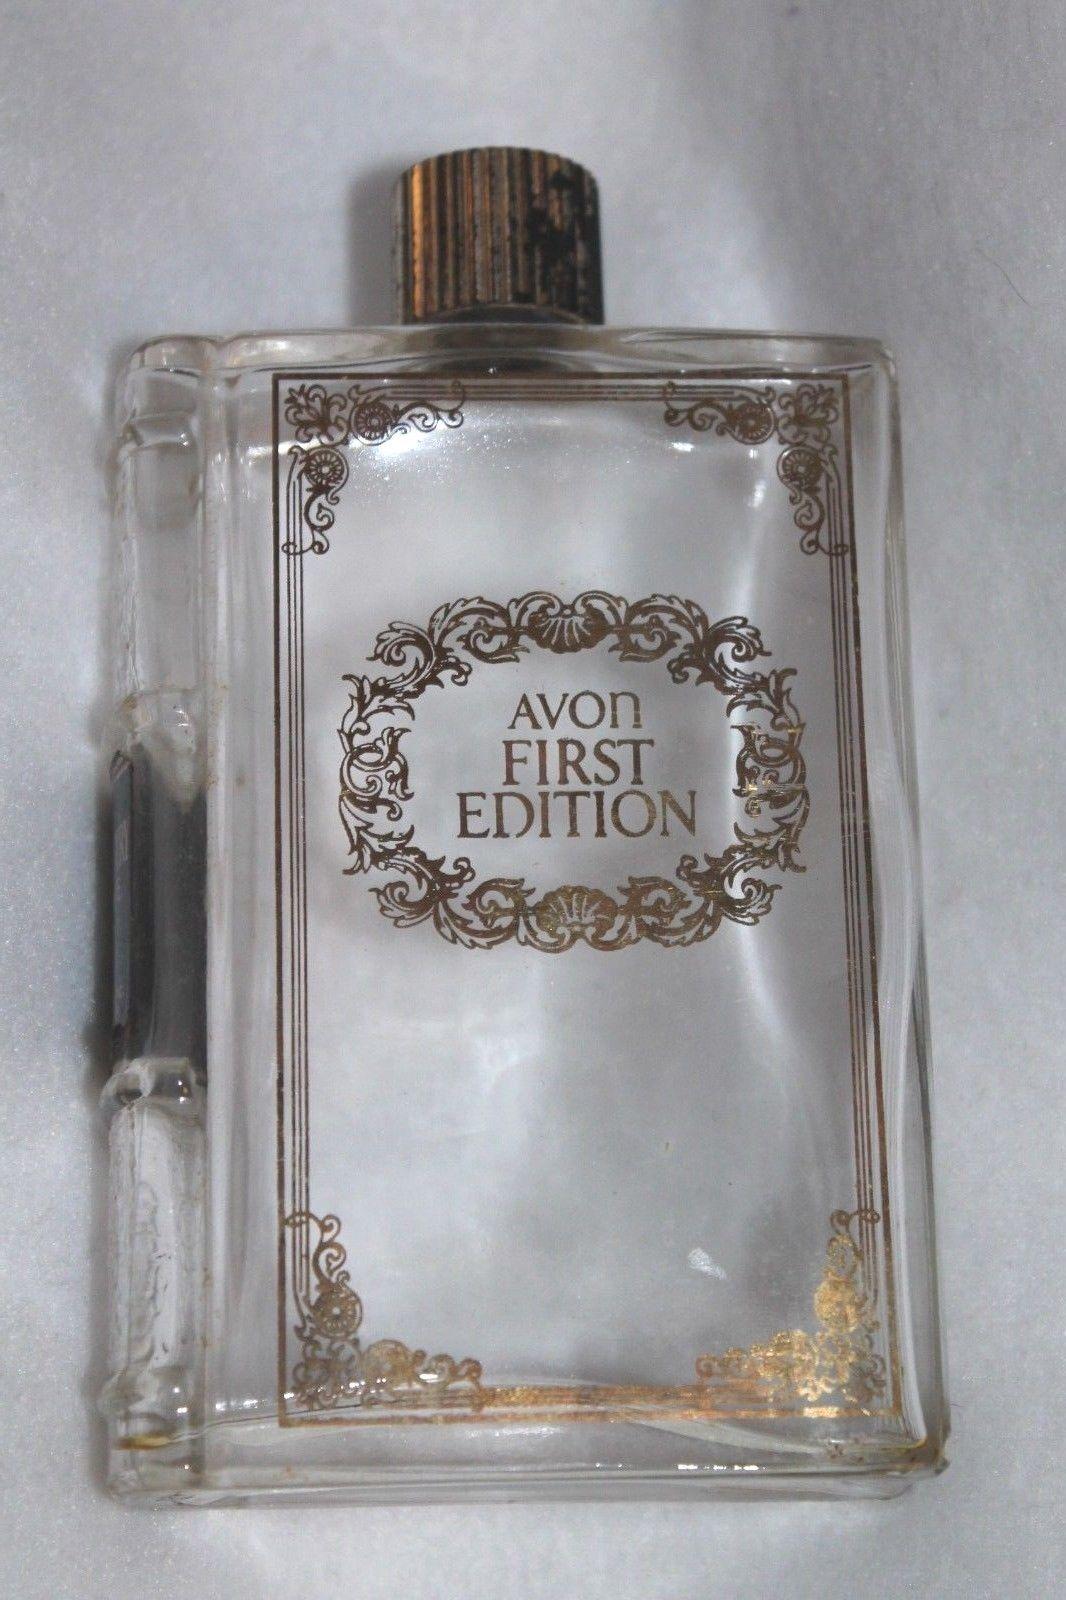 Vintage Empty Avon Aftershave Bottle - 6 OZ - Book Design